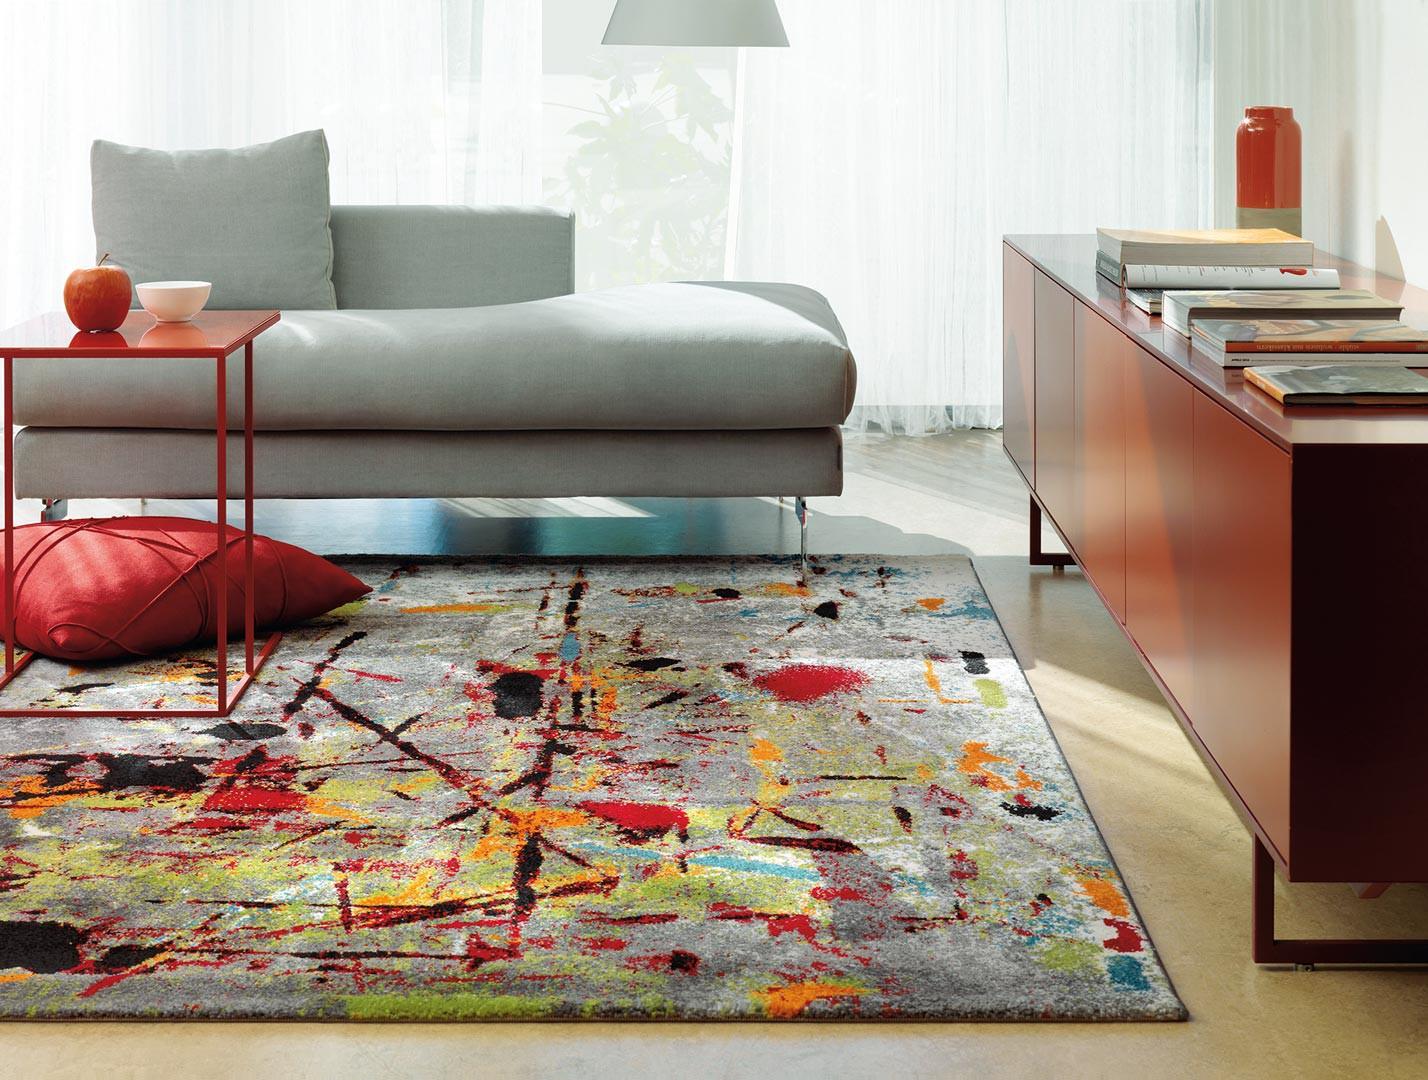 tapis salon multicolore tapis rond salon amazon tapis. Black Bedroom Furniture Sets. Home Design Ideas